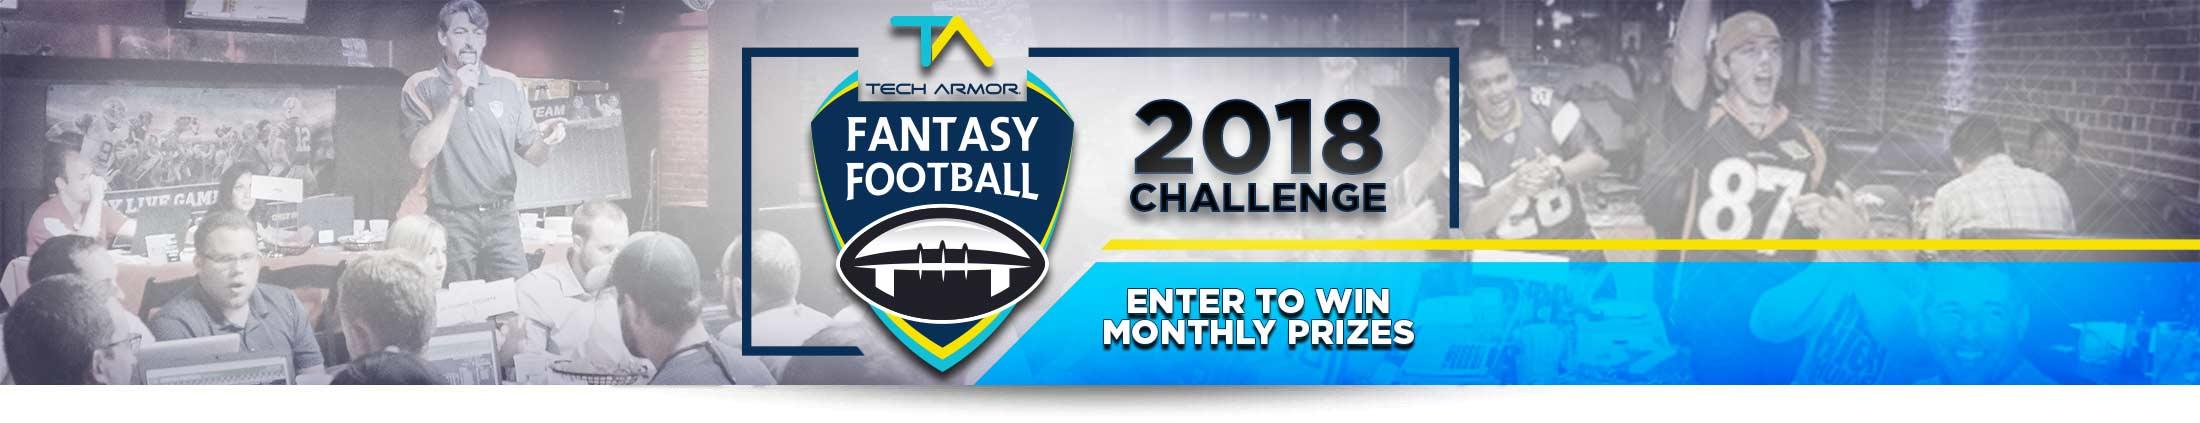 Fantasy Football Challenge 2018